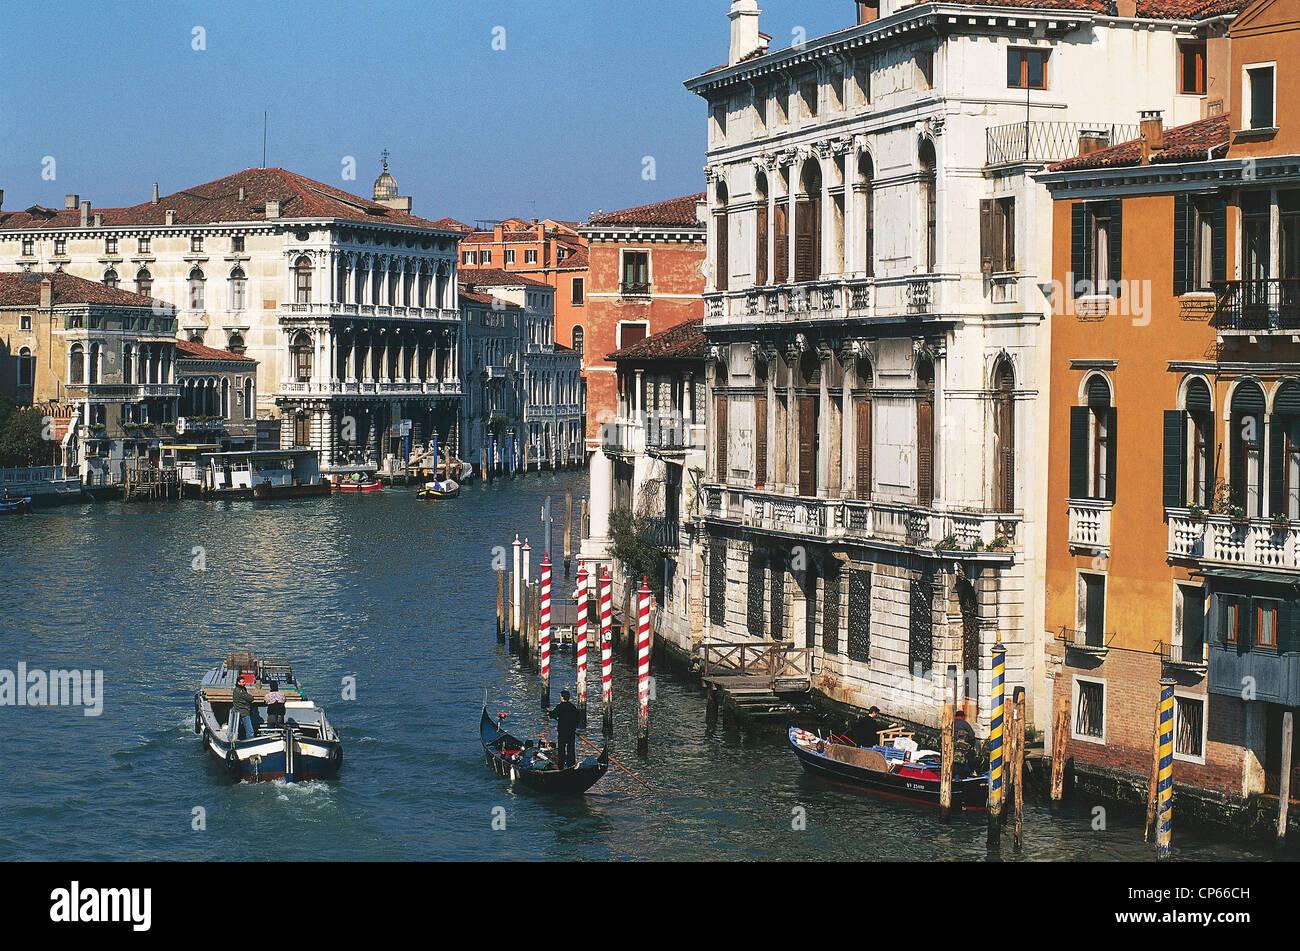 VENETO Venice Grand Canal from the Accademia Bridge - Stock Image